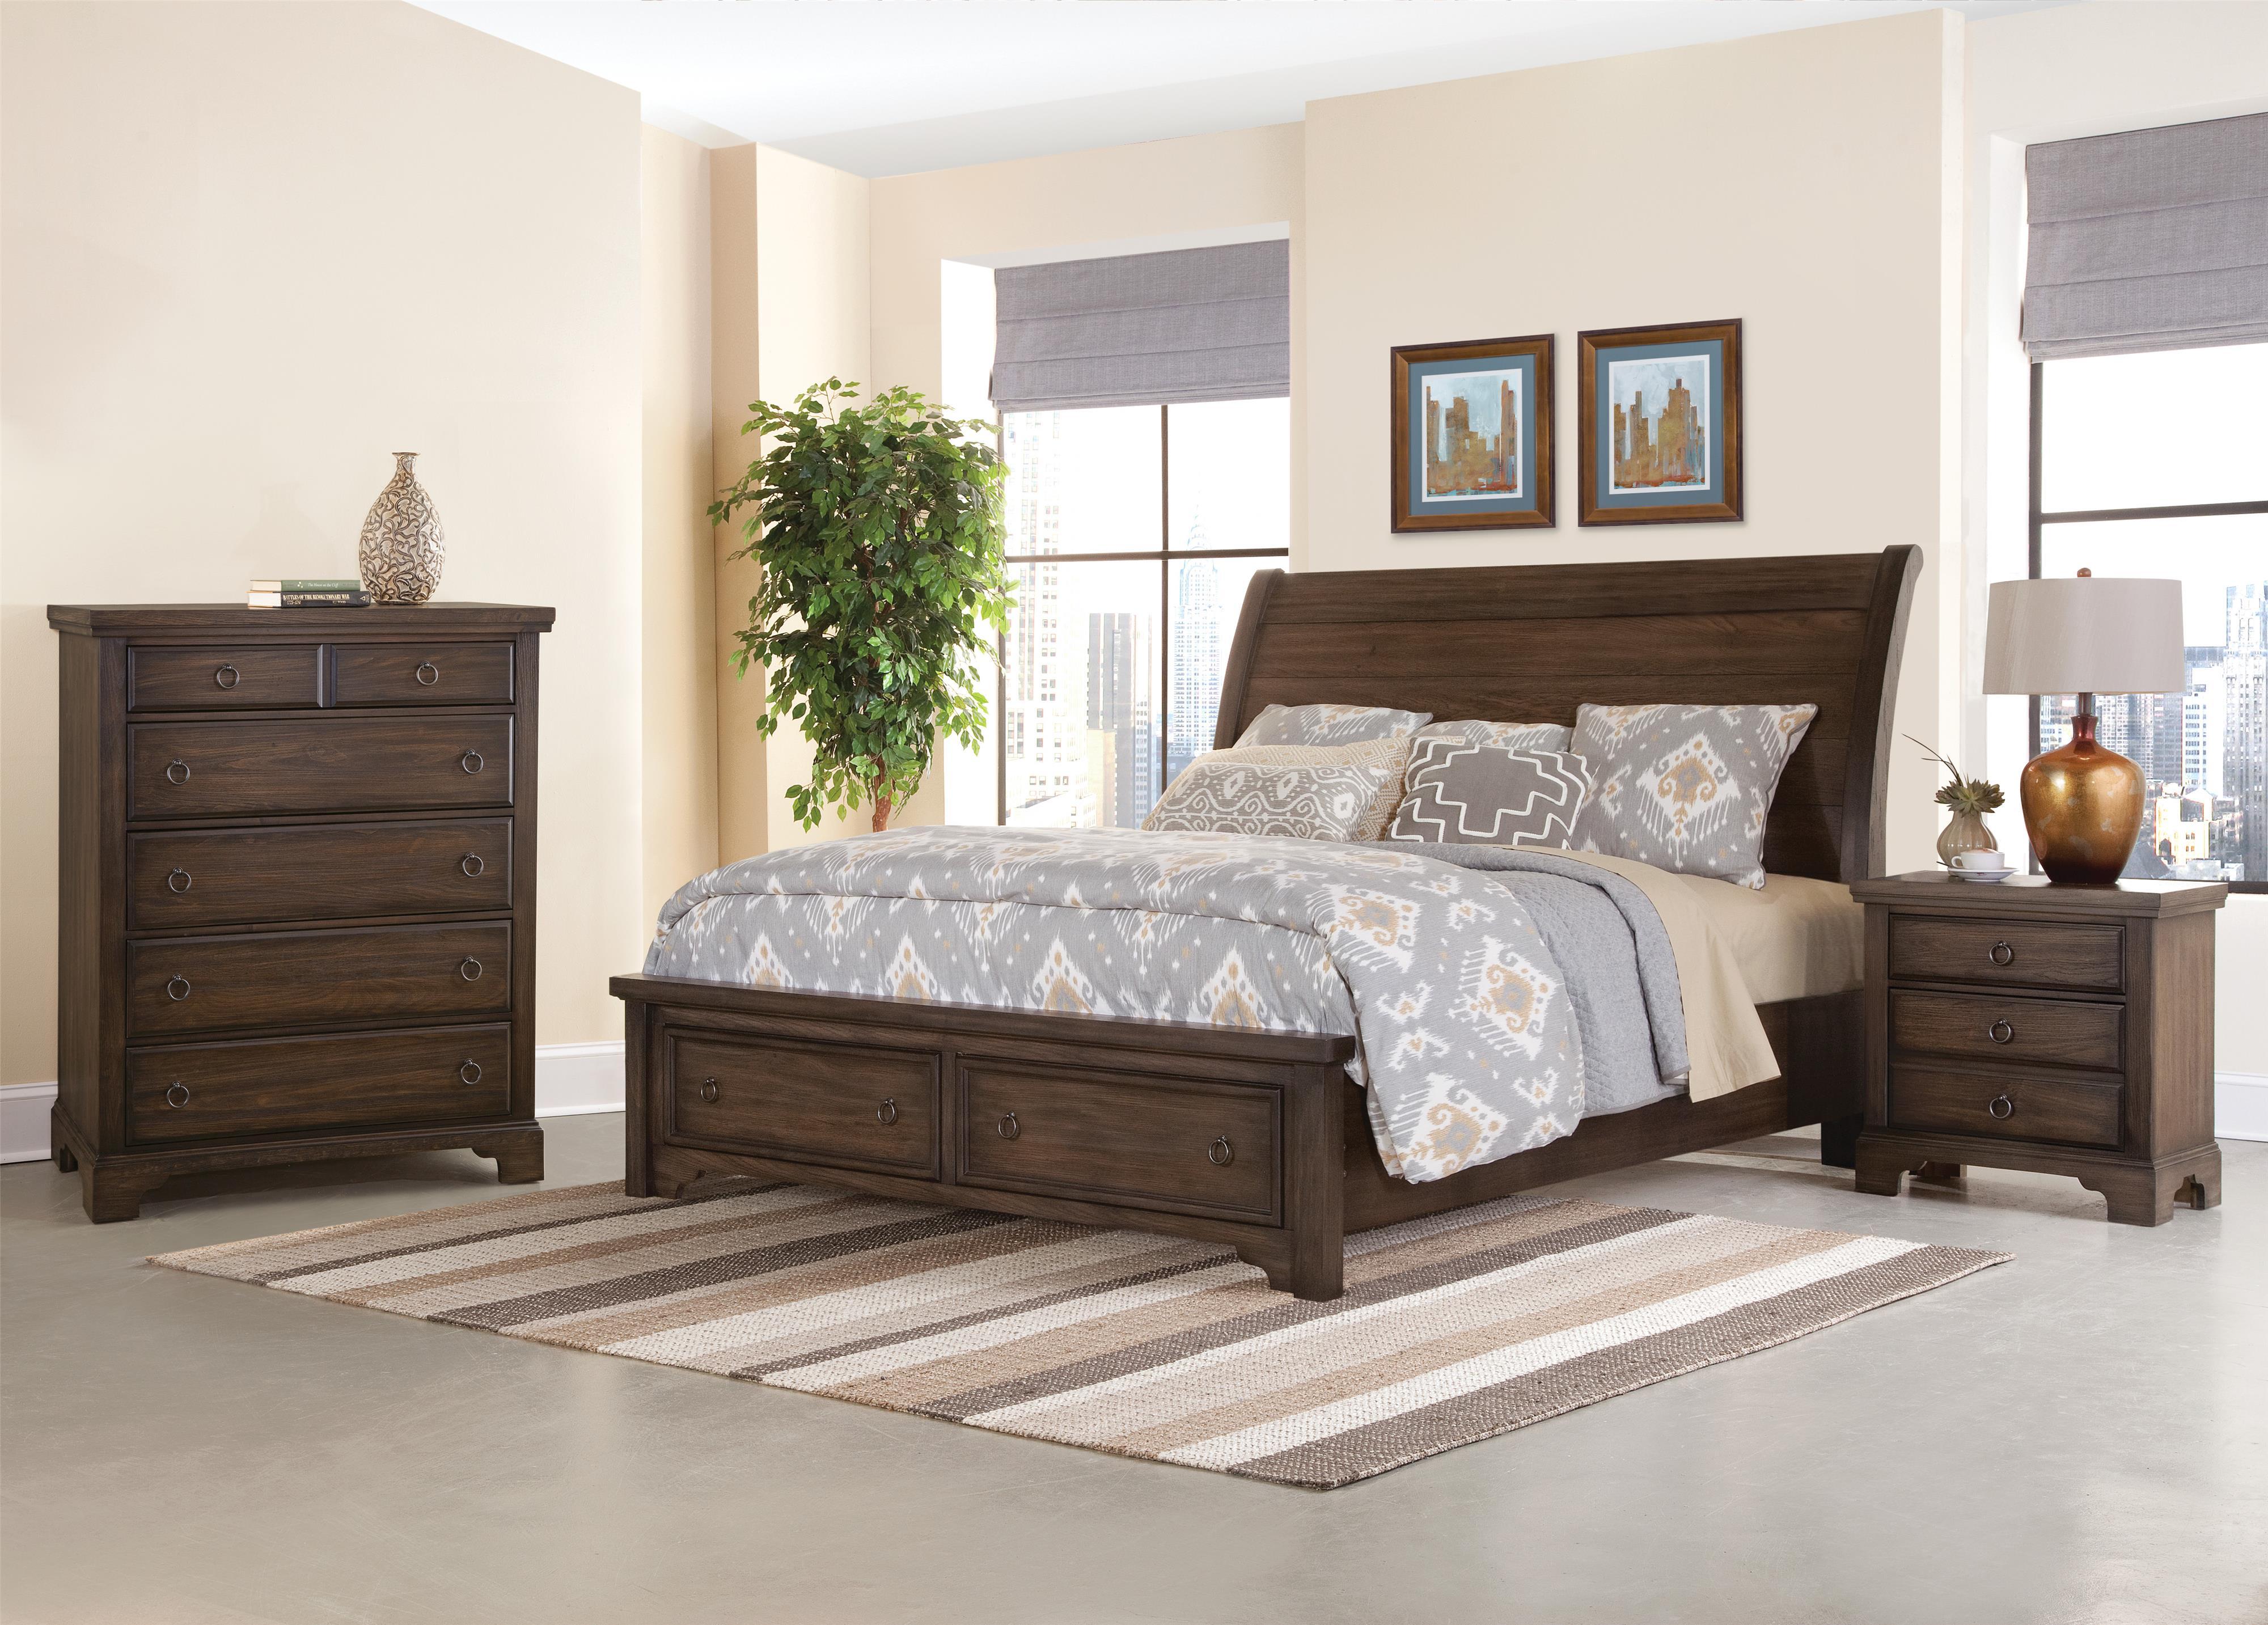 vaughan bassett whiskey barrel queen bedroom group dunk bright furniture bedroom group. Black Bedroom Furniture Sets. Home Design Ideas